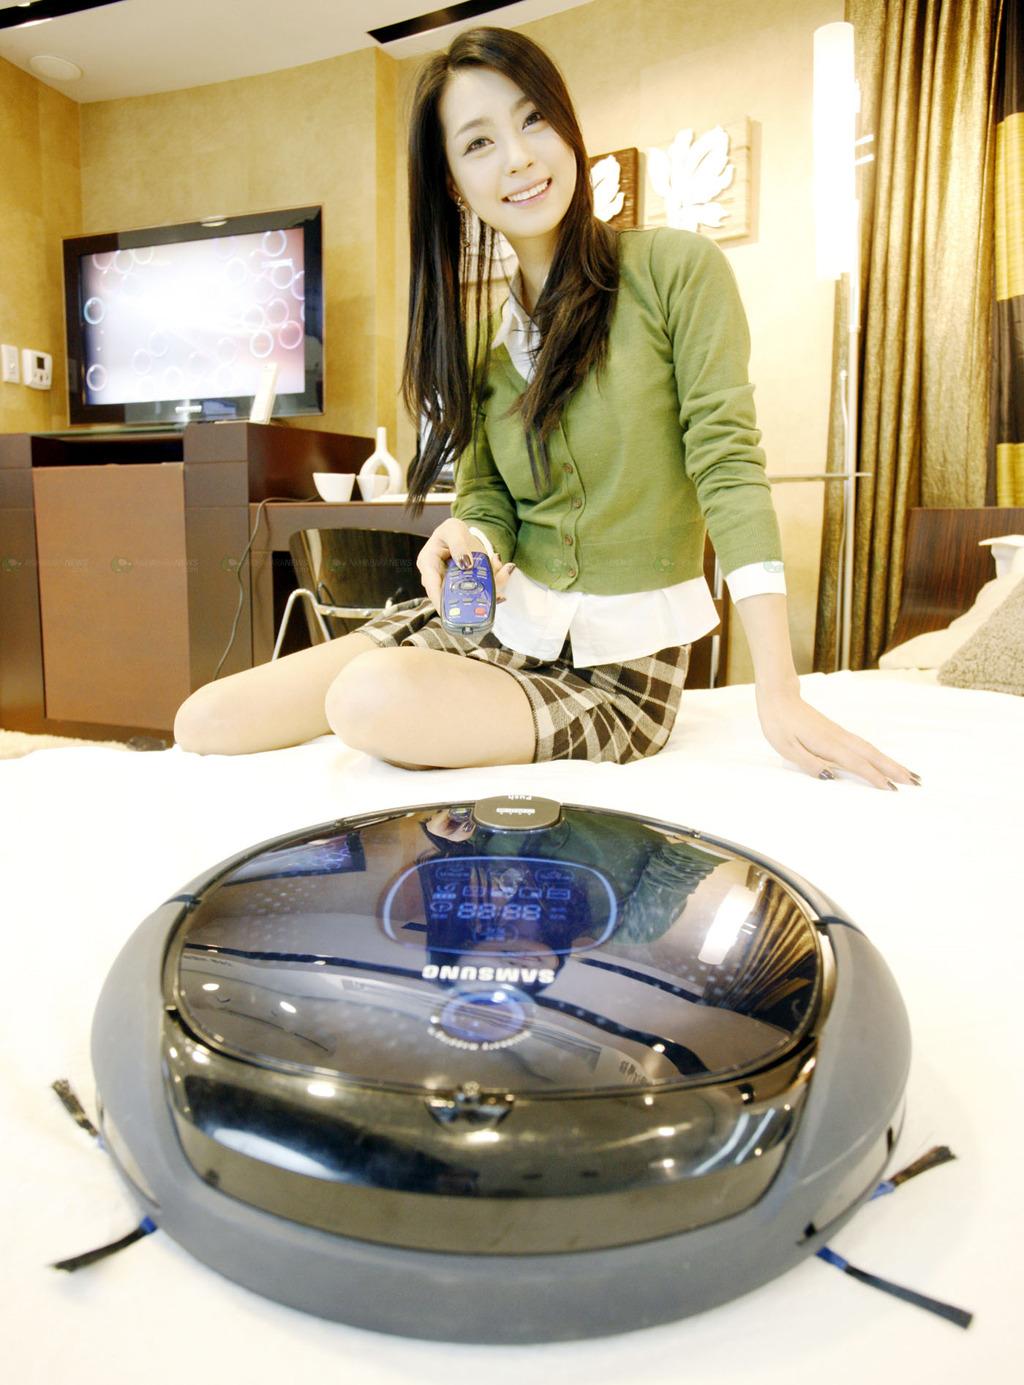 Domesro More On The Latest Samsung Domestic Robot